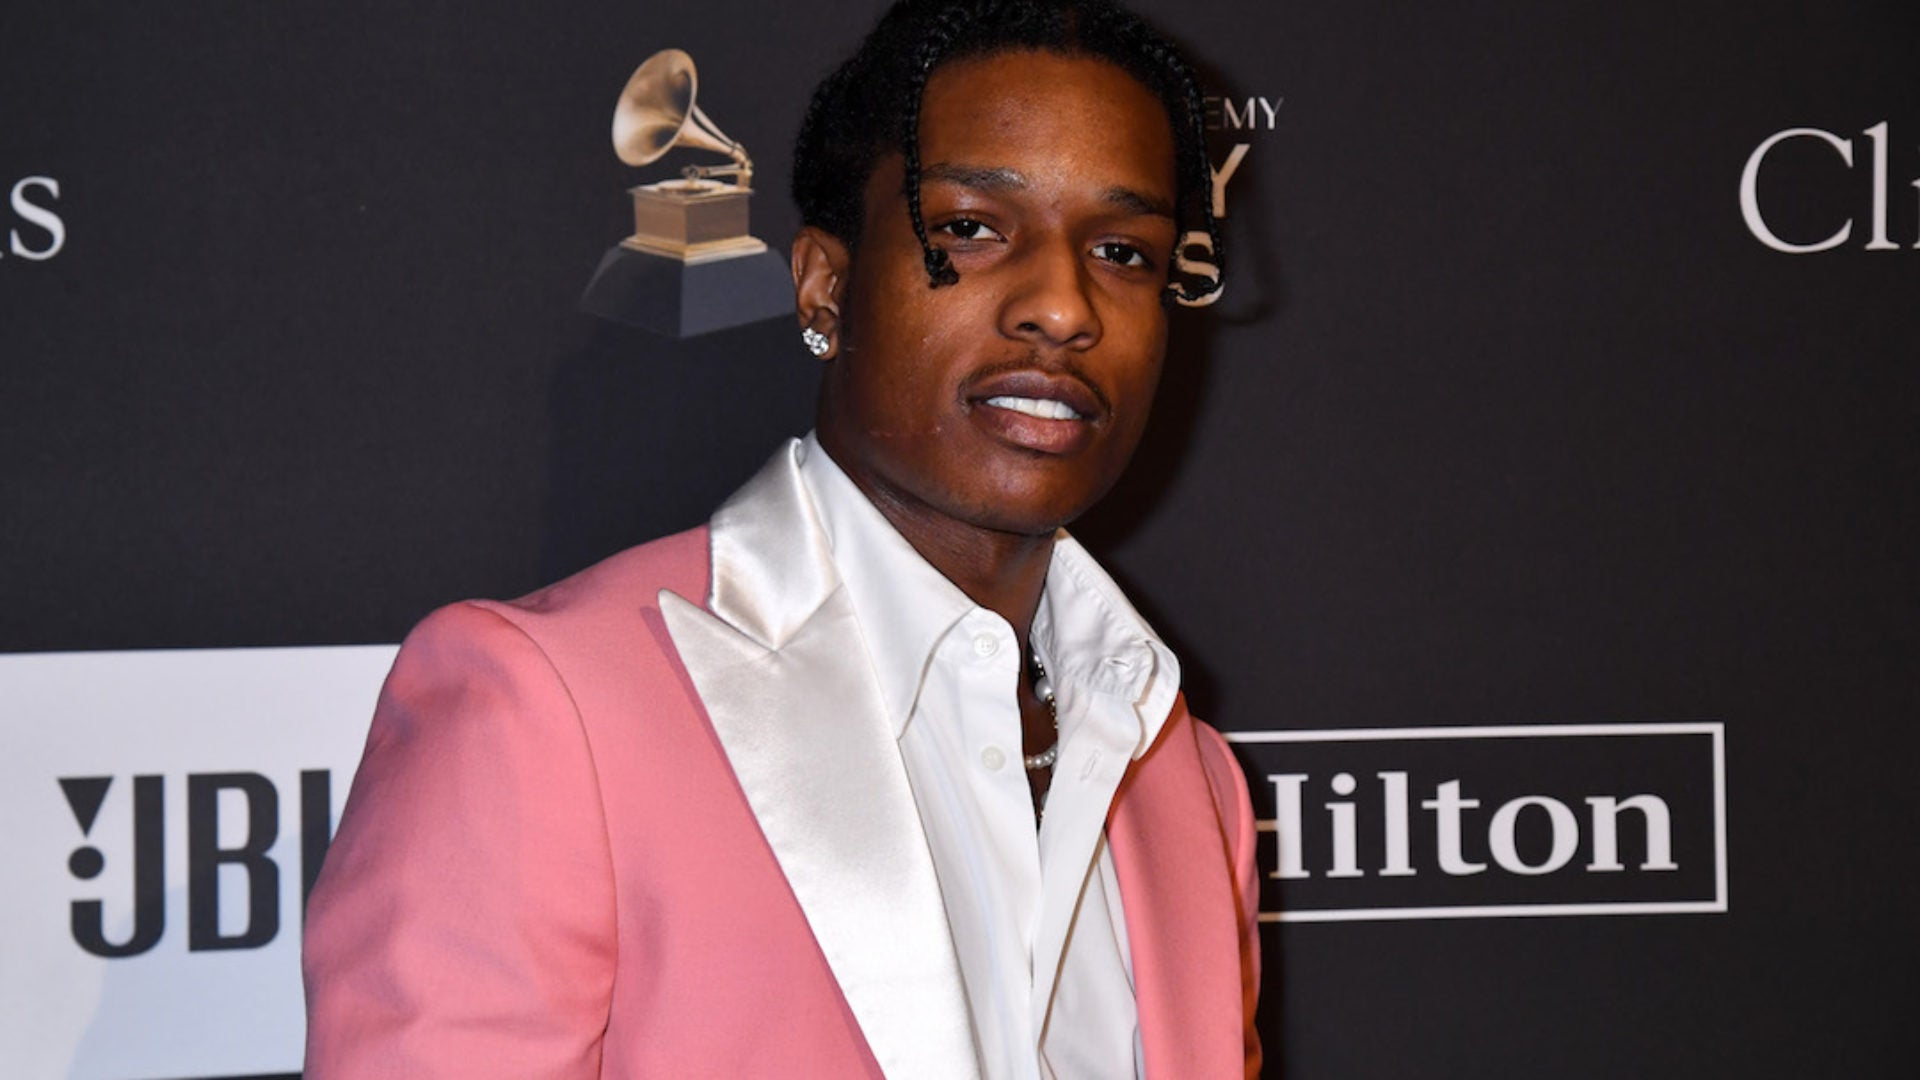 ASAP Rocky Found Guilty Of Assault, Will Serve No Jail Time